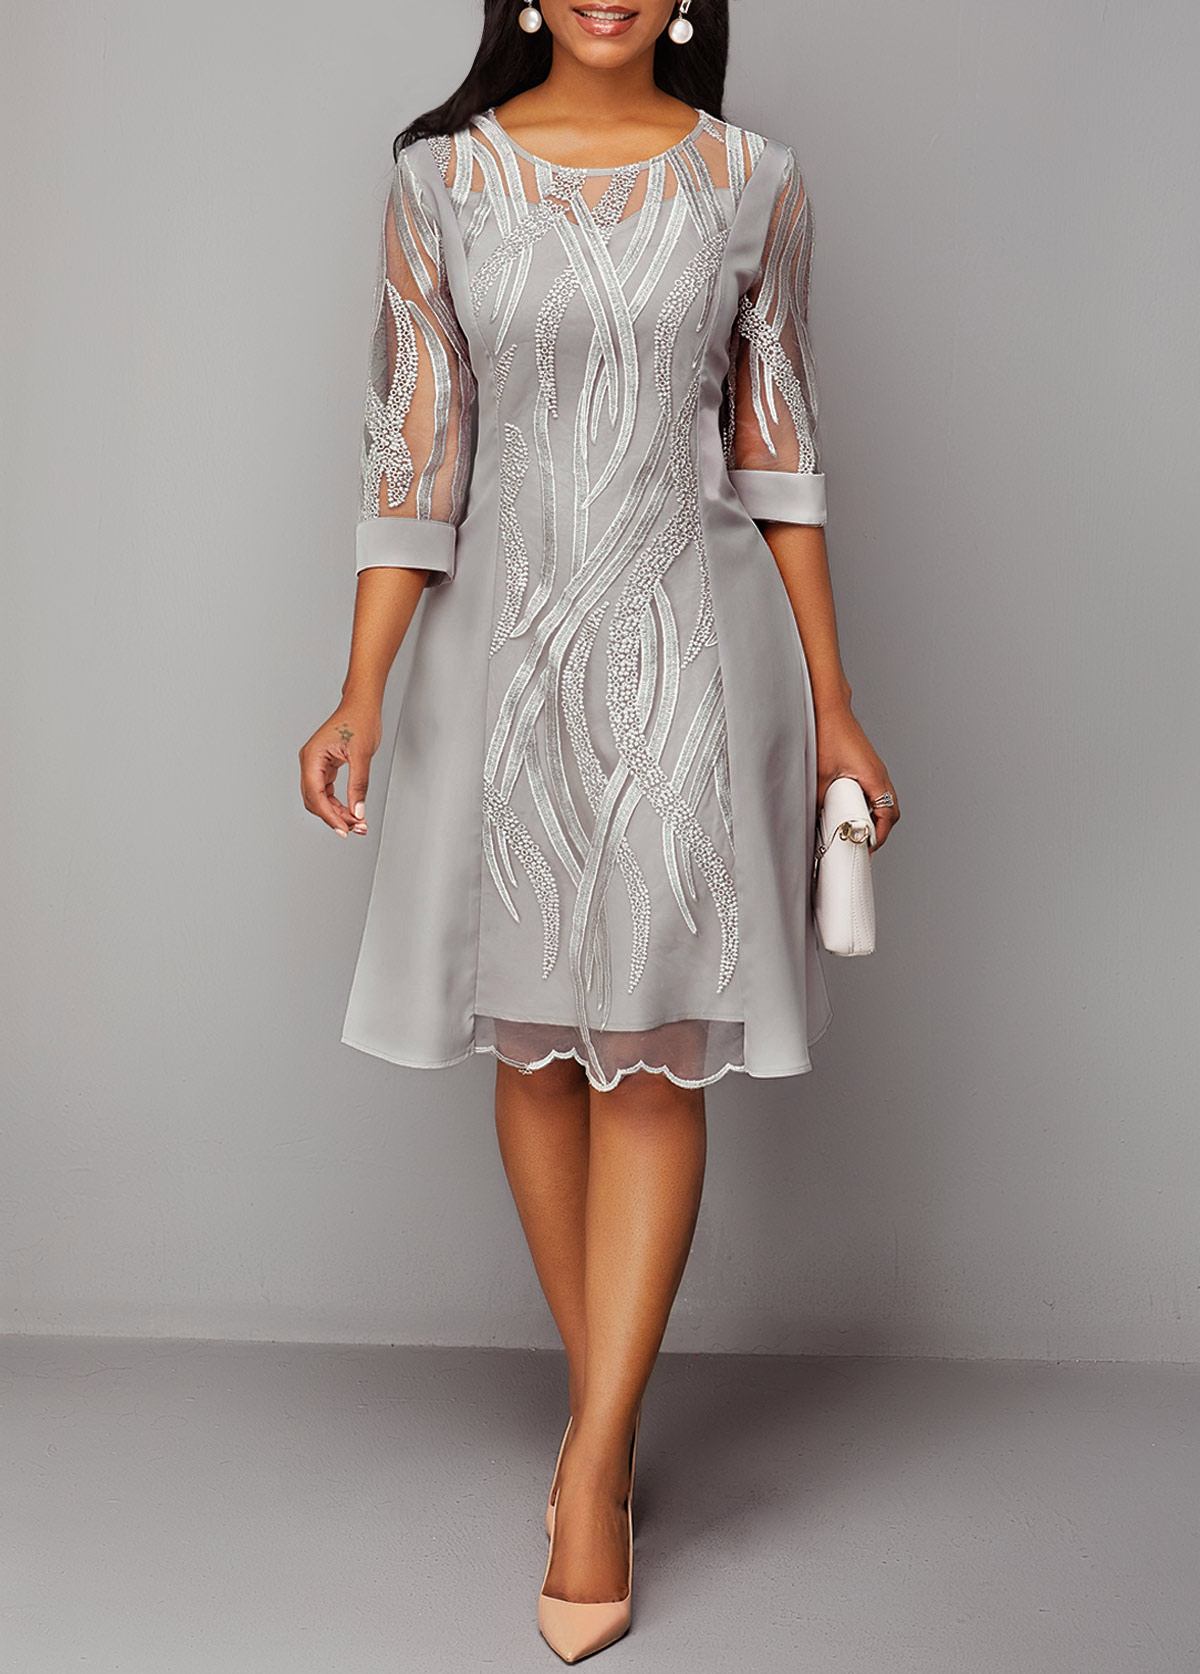 Three Quarter Sleeve Back Zipper Round Neck Lace Dress